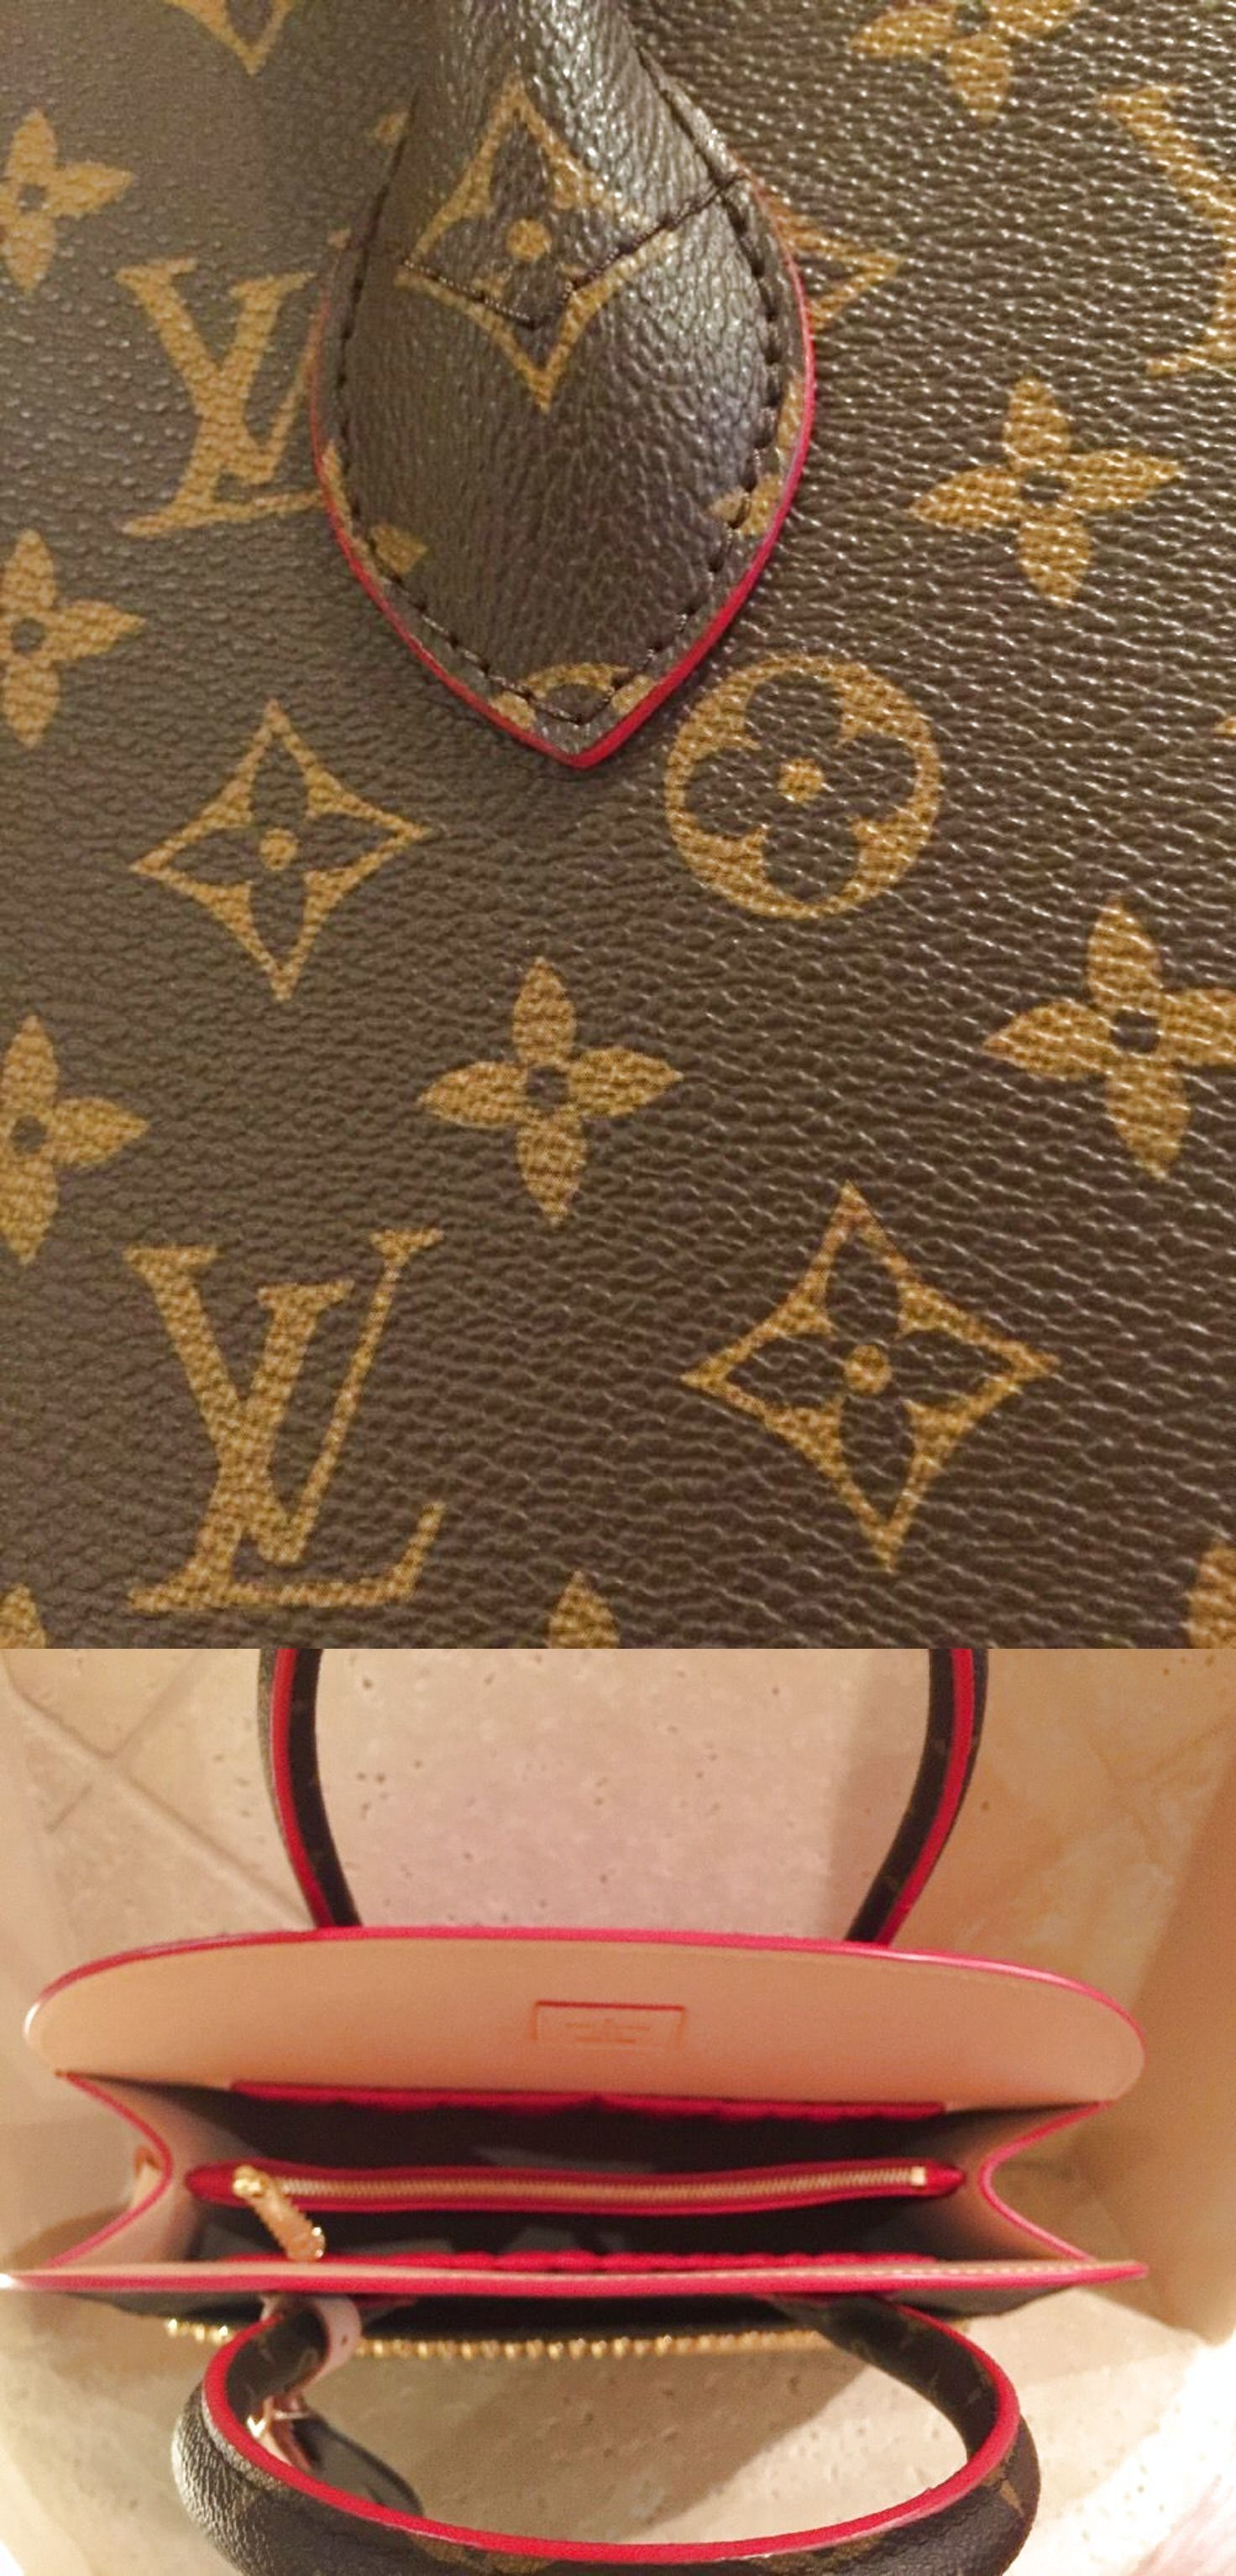 85eeb986be8 Louis Vuitton Christian Louboutin Brown LV Monogram Red Pony Hair ...